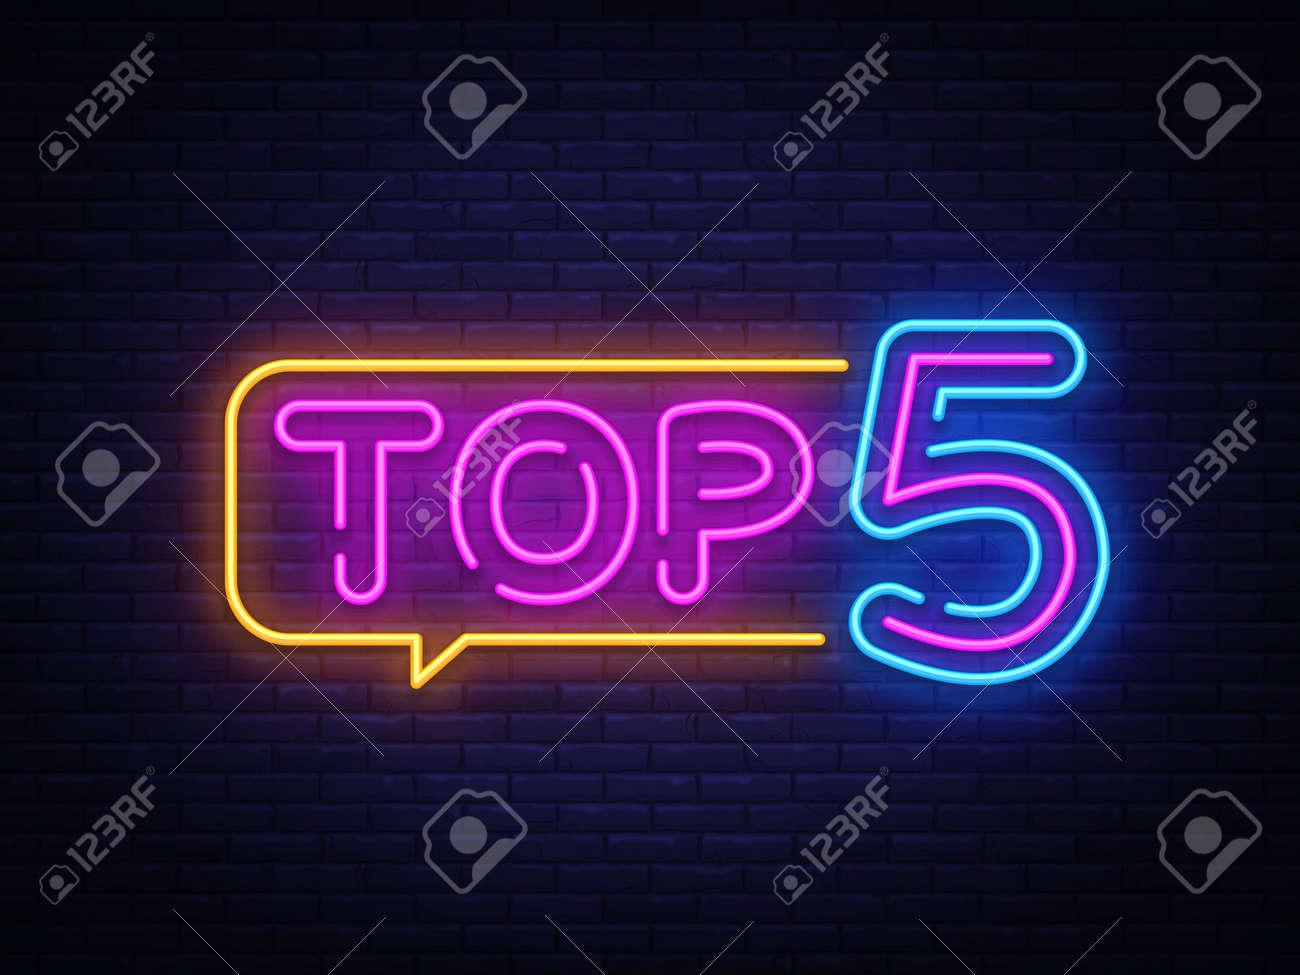 Top 5 Neon Text Vector. Top Five neon sign, design template, modern trend design, night neon signboard, night bright advertising, light banner, light art. Vector illustration. - 111889358